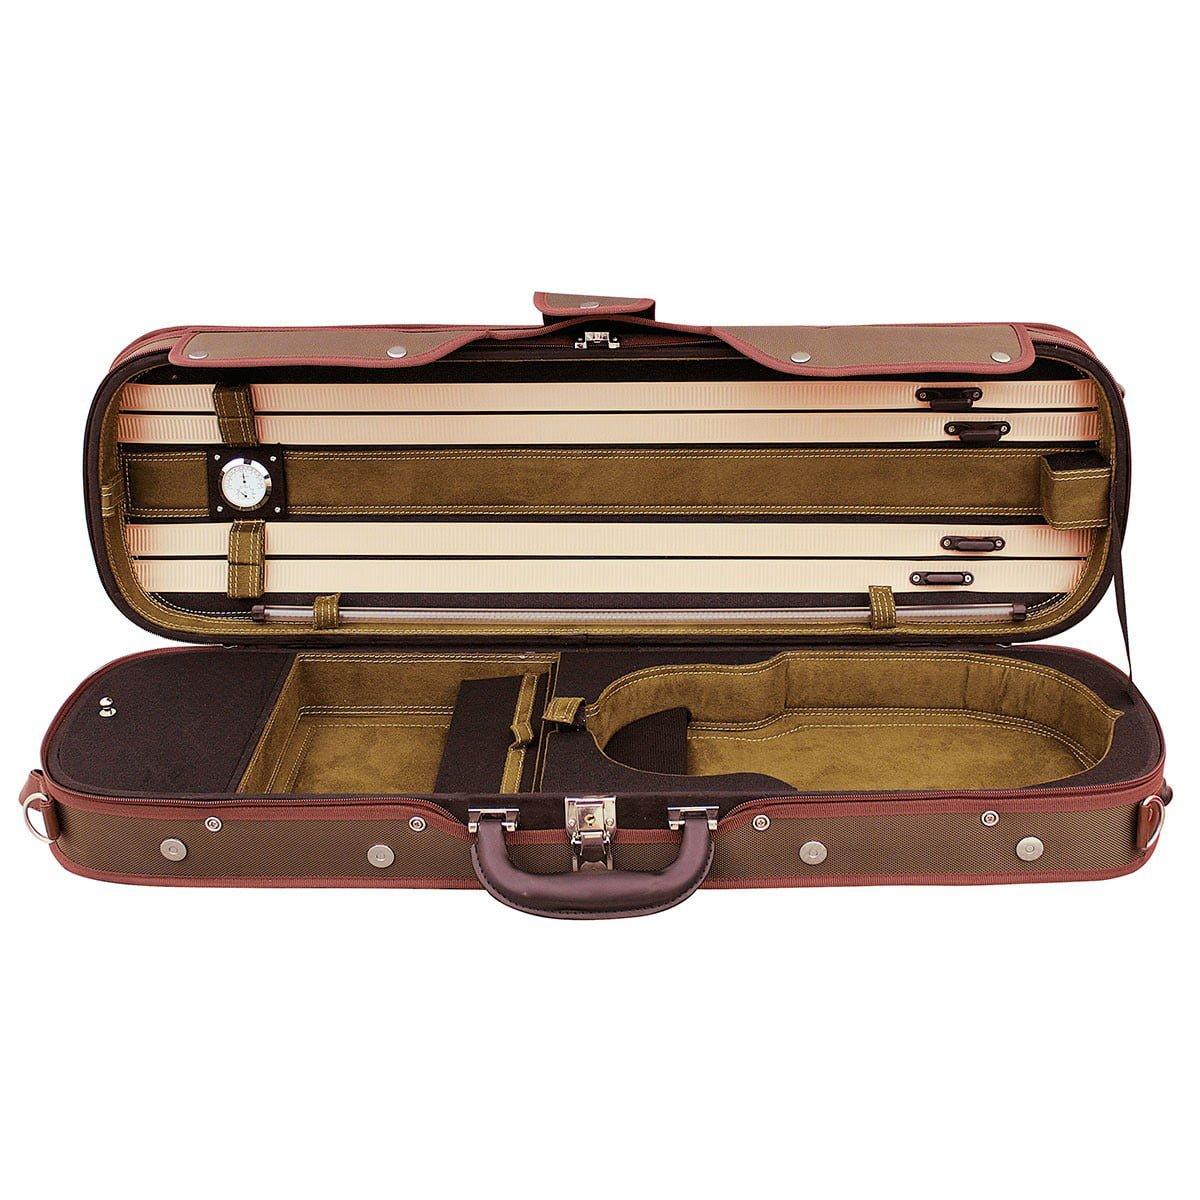 Hidersine Case Violin 4/4 Light Oblong VC802 Open